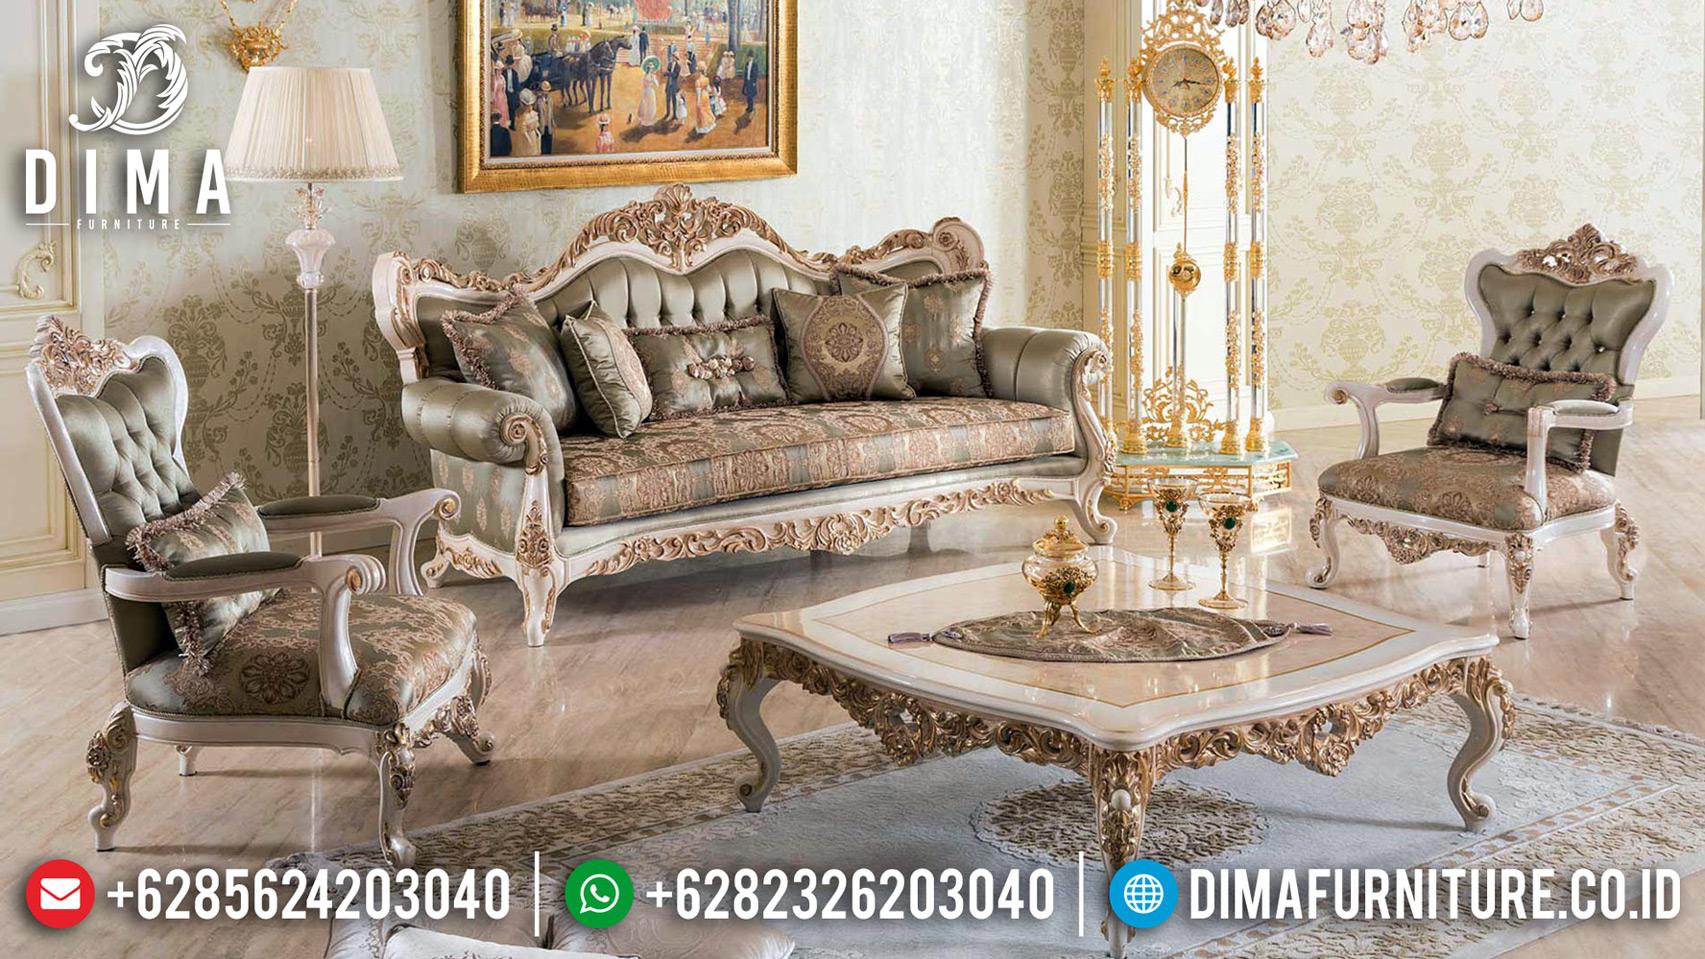 Jual Sofa Tamu Mewah Jepara New Design Luxury Classic Empire Style BT-0647